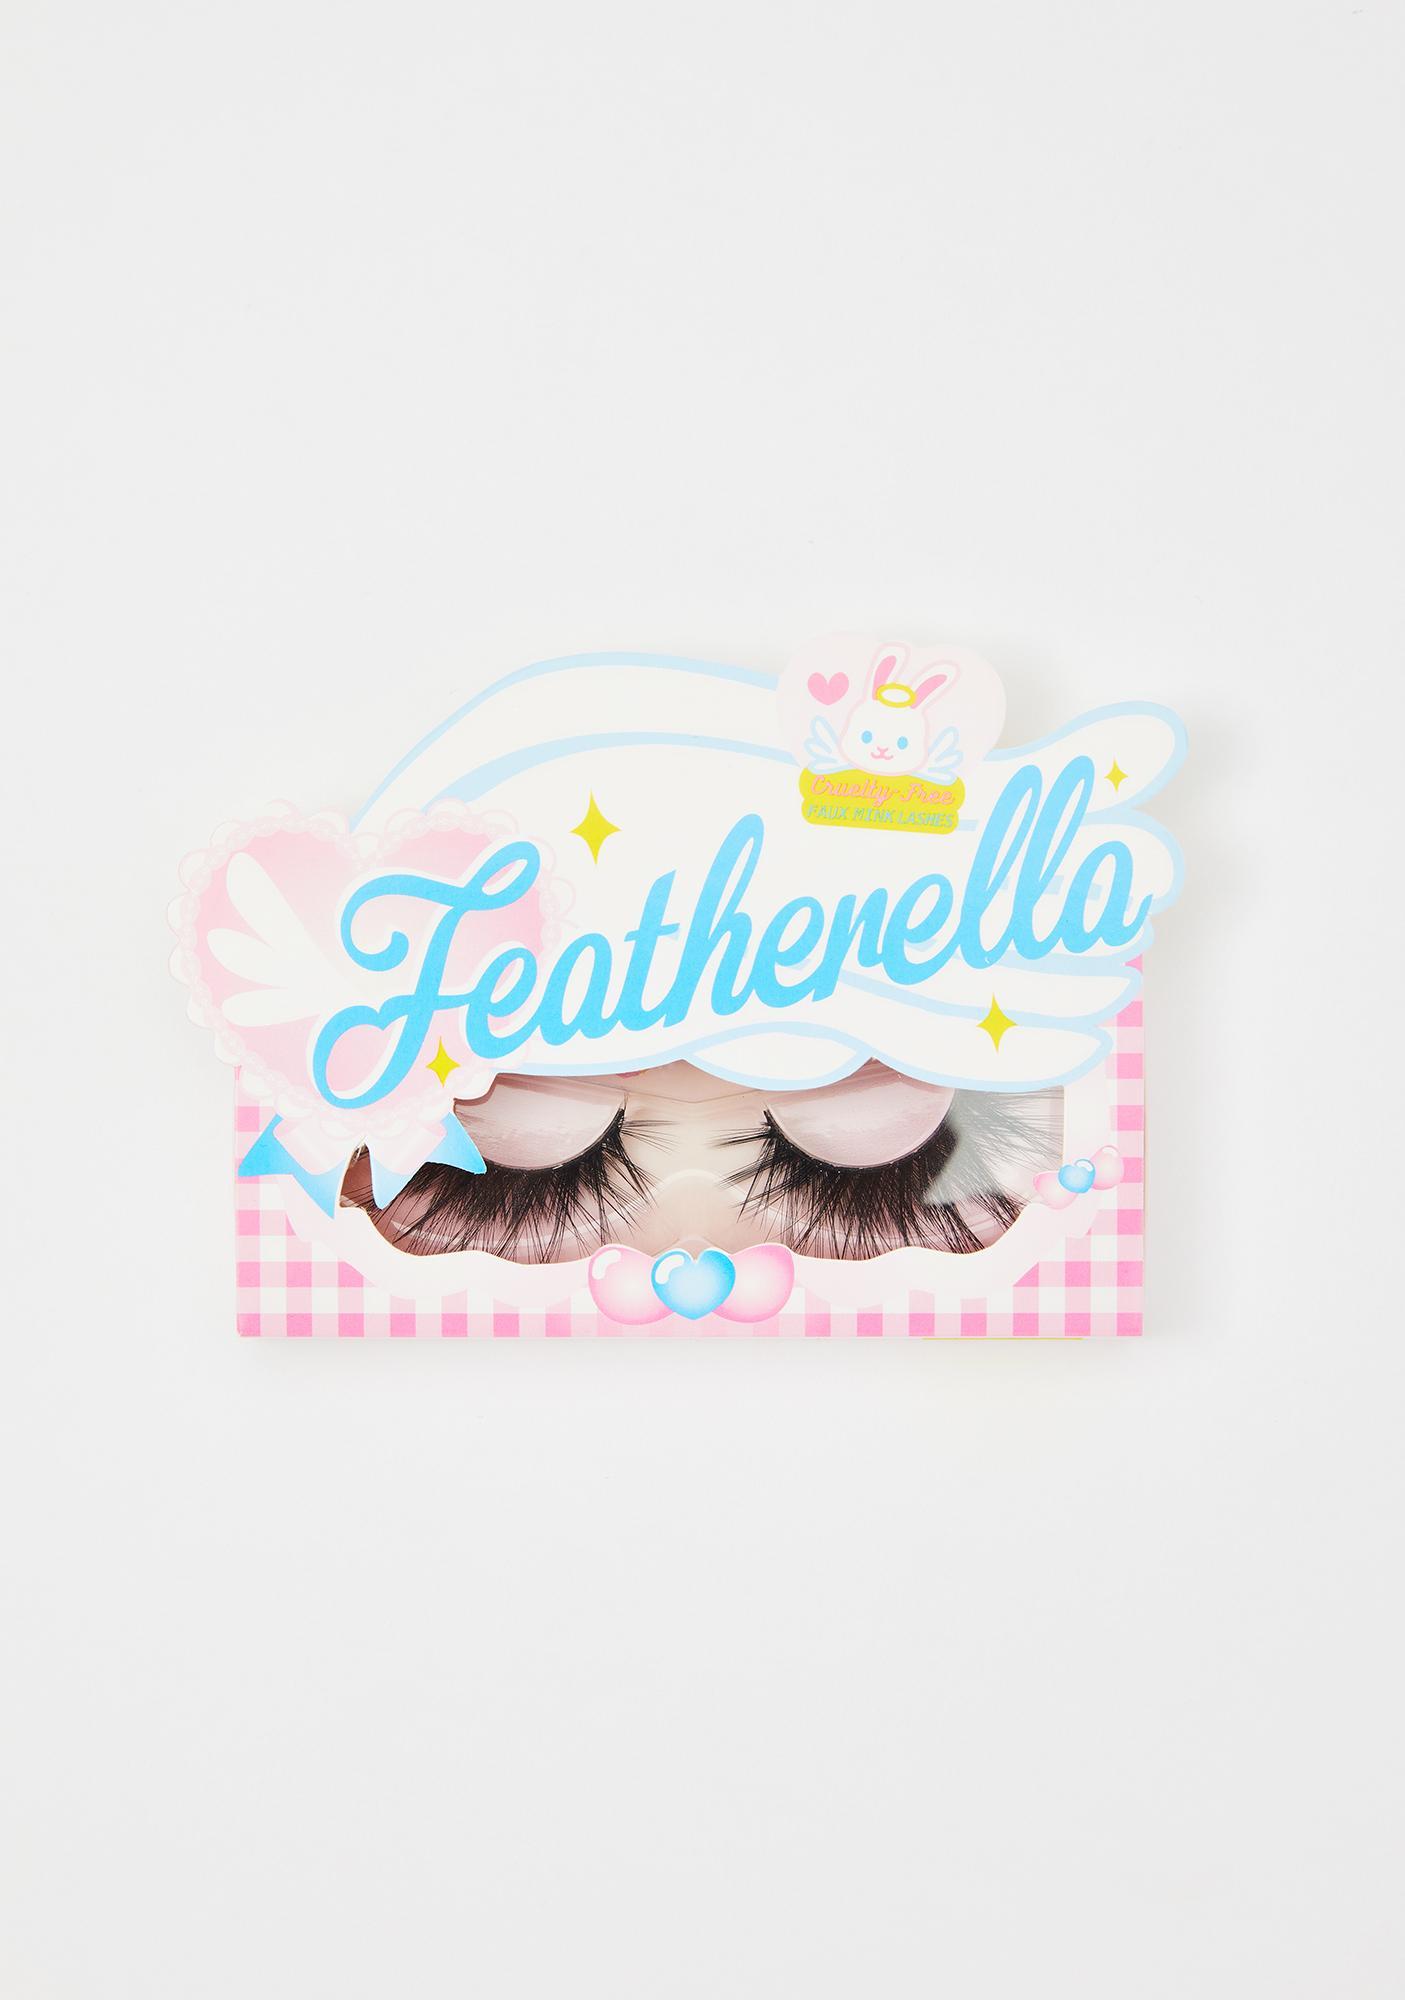 55f57111656 Featherella Beauty Venus Lashes; Featherella Beauty Venus Lashes ...